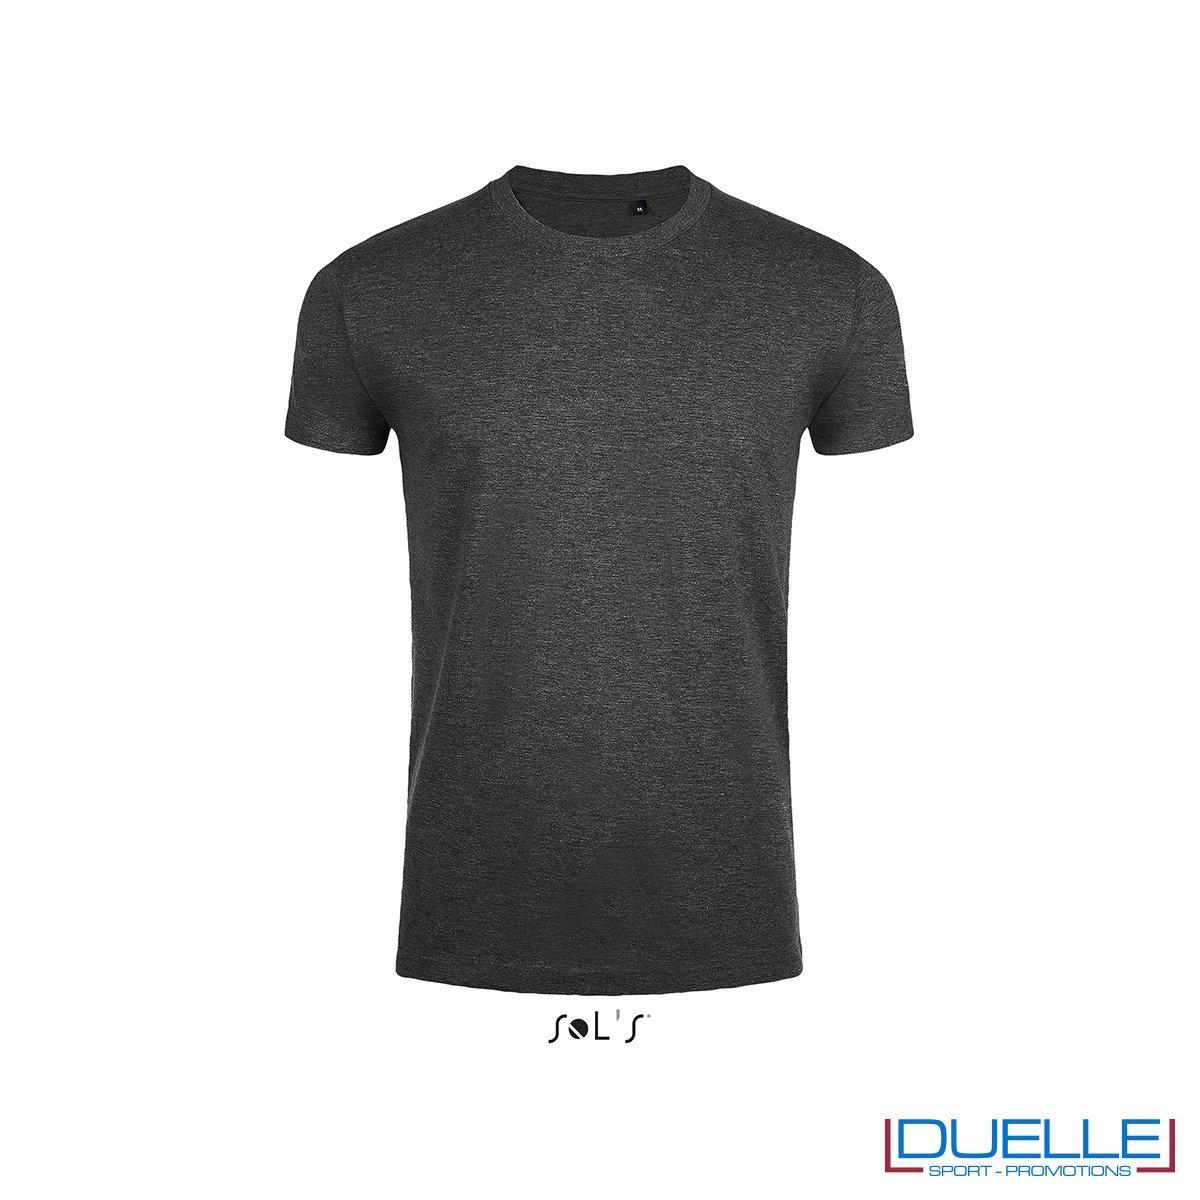 T-shirt uomo slim fit in cotone pesante colore antracite melange